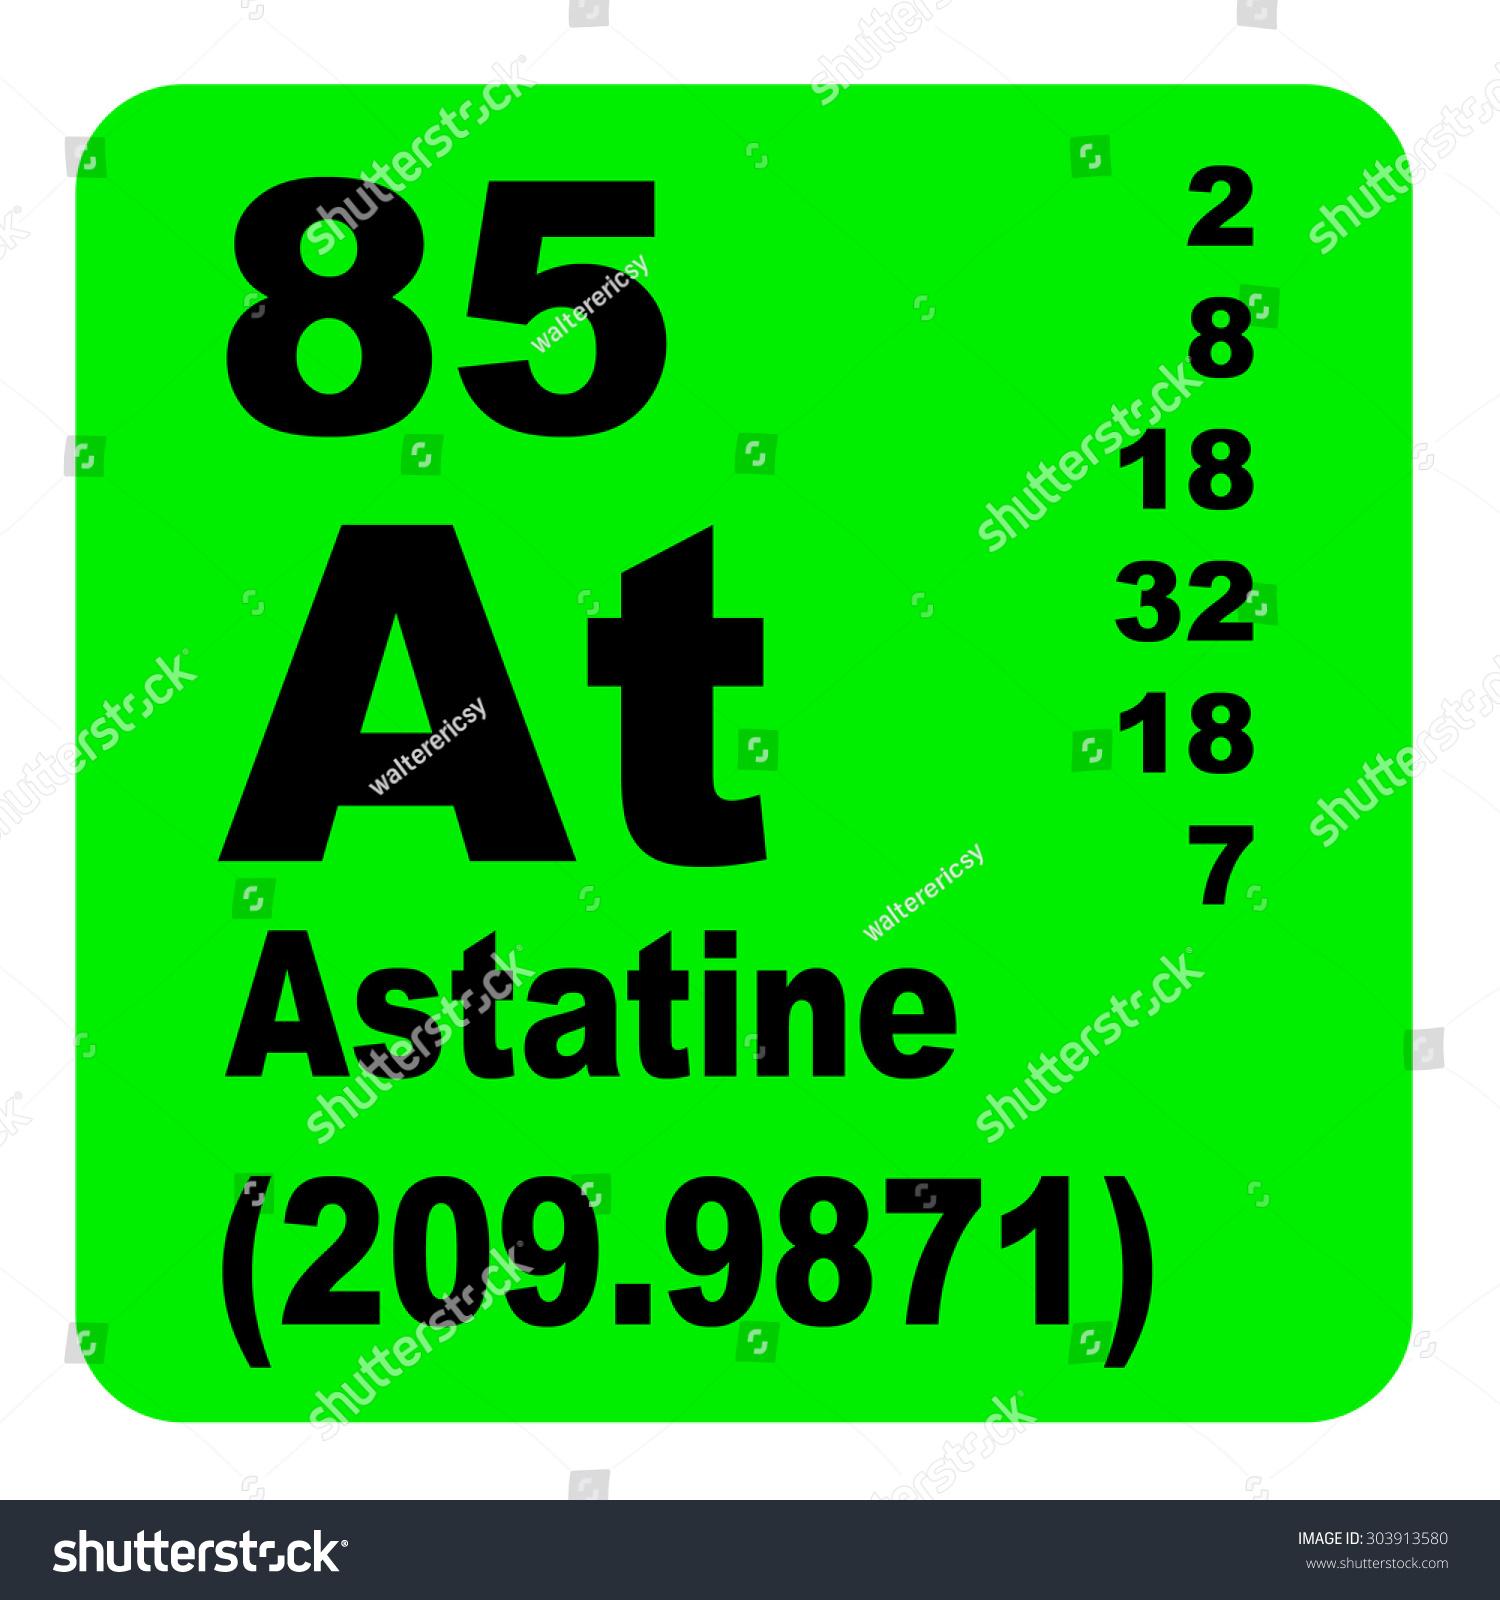 Astatine Periodic Table Elements Stock Illustration 303913580